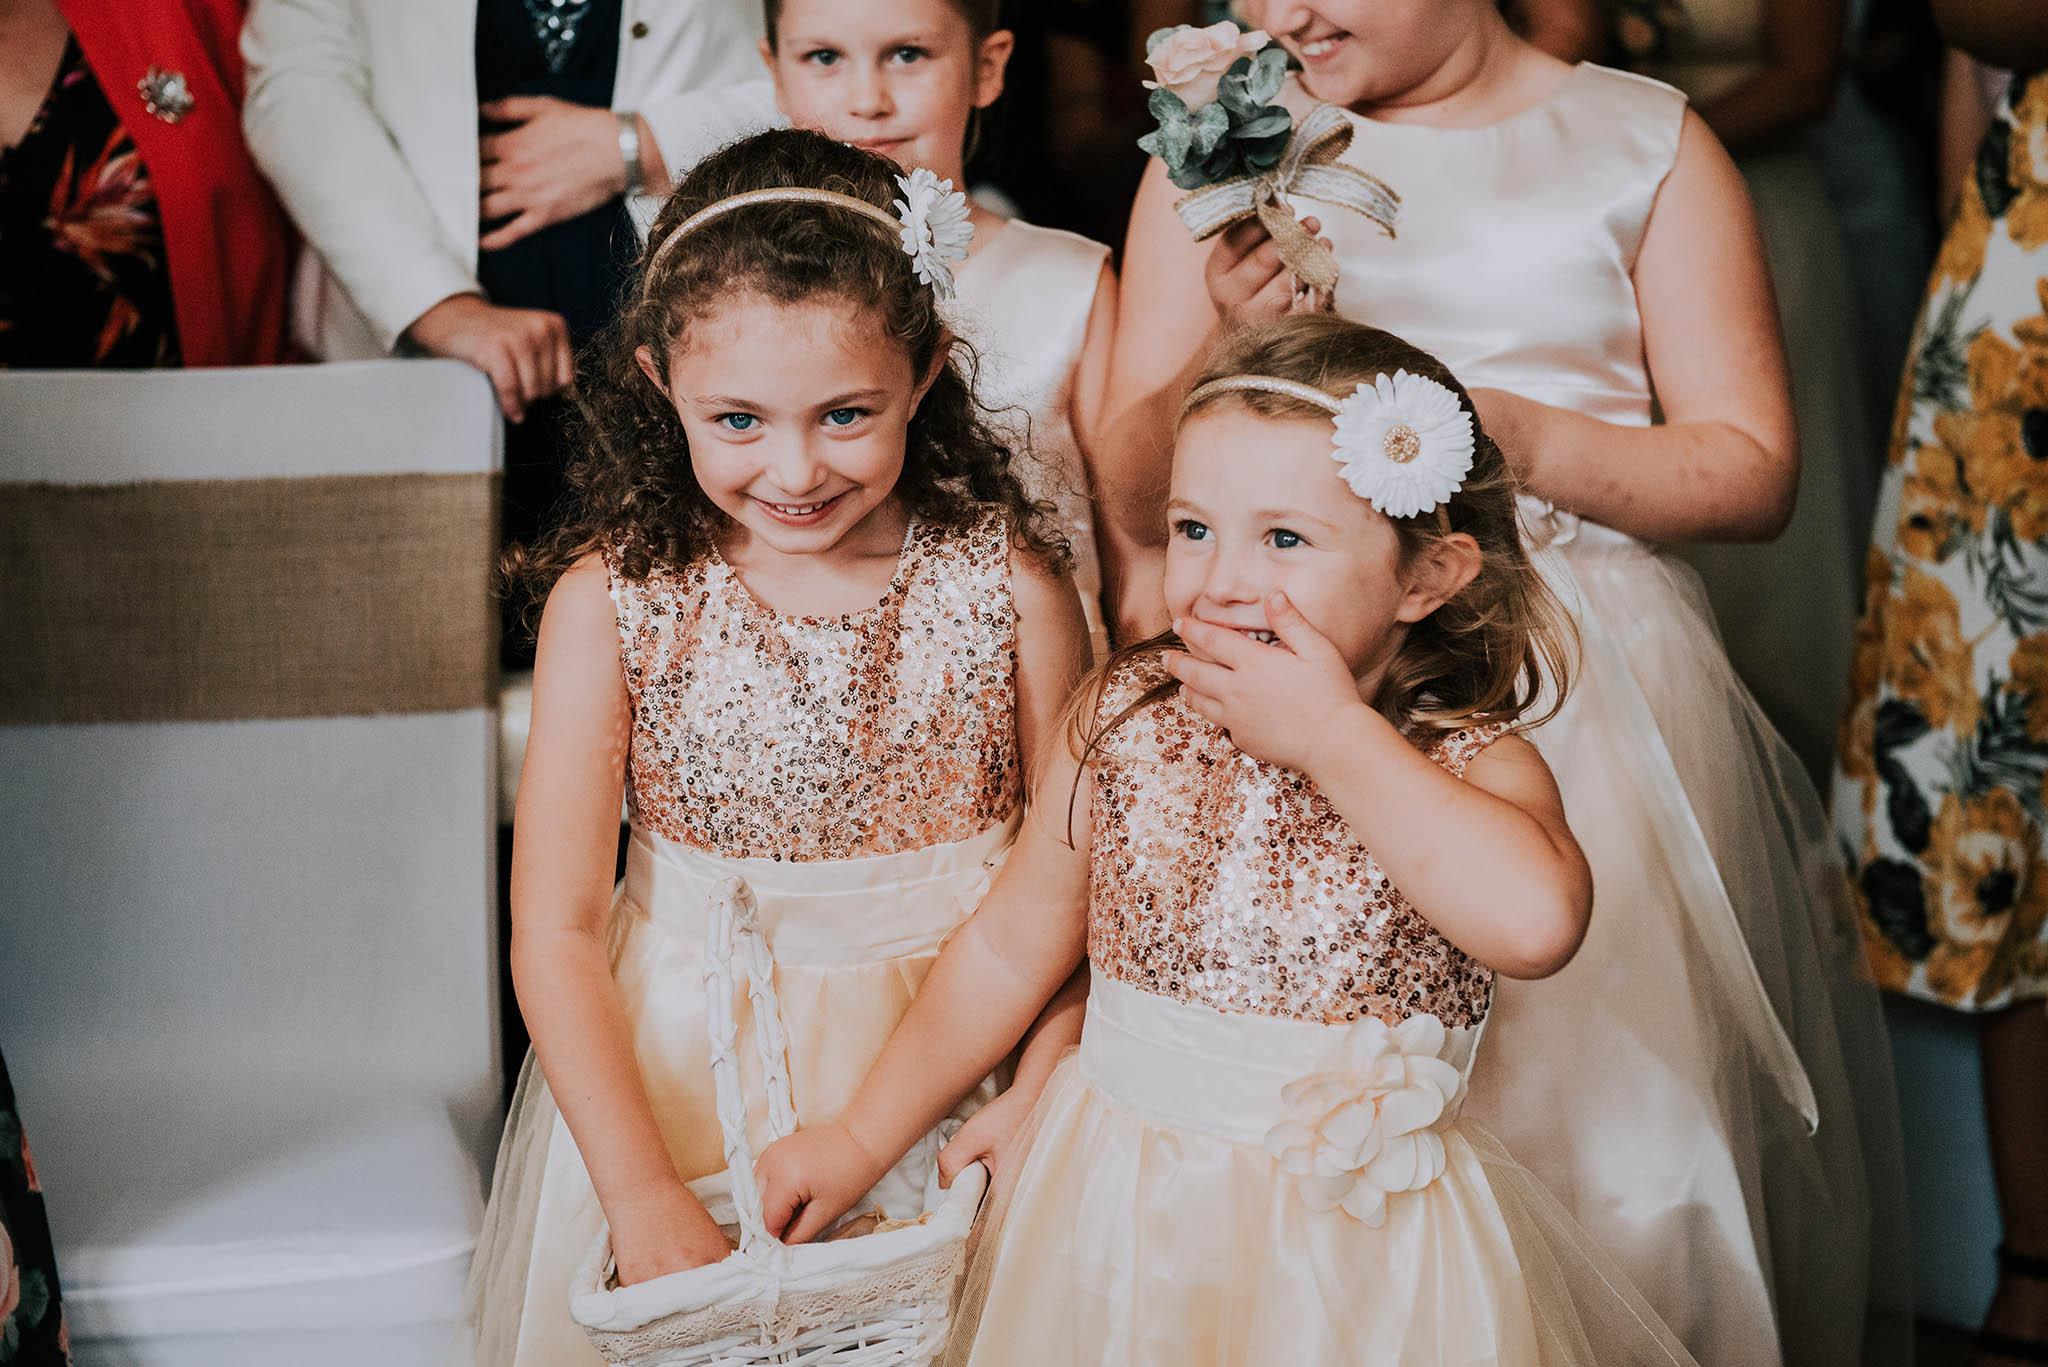 JC126-wedding-blog-scott-stockwell-photography-end-2017.jpg